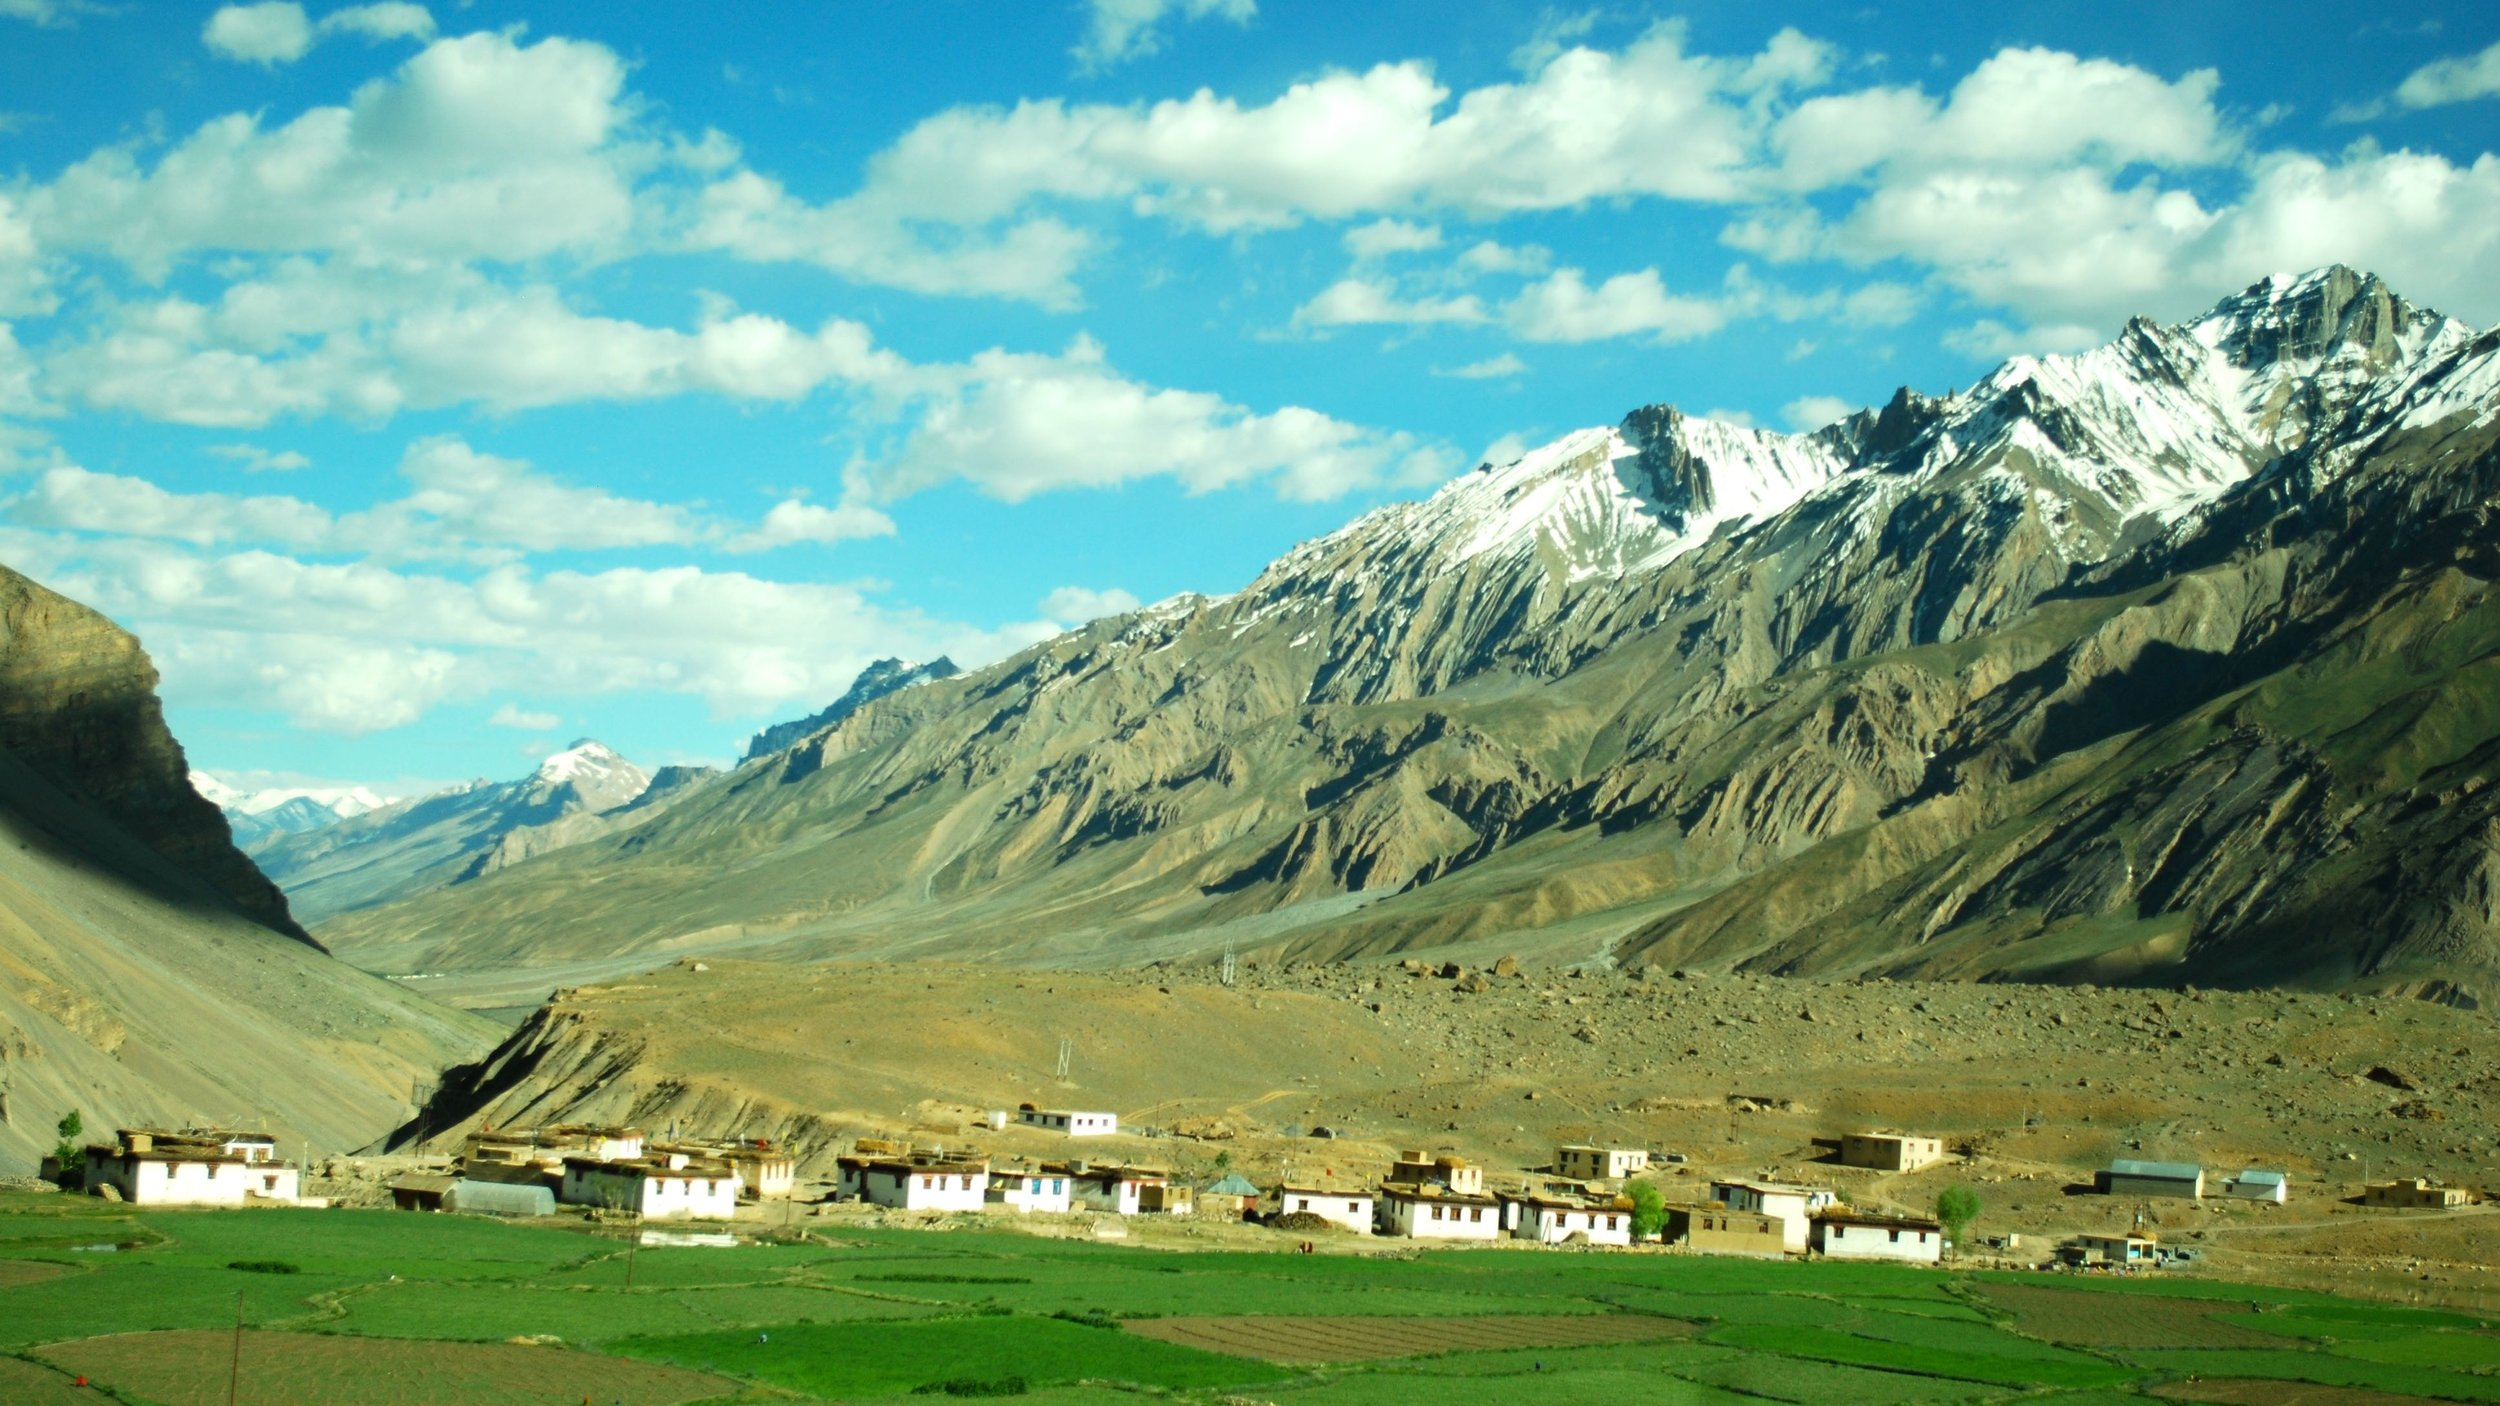 India-Spiti-village.jpg